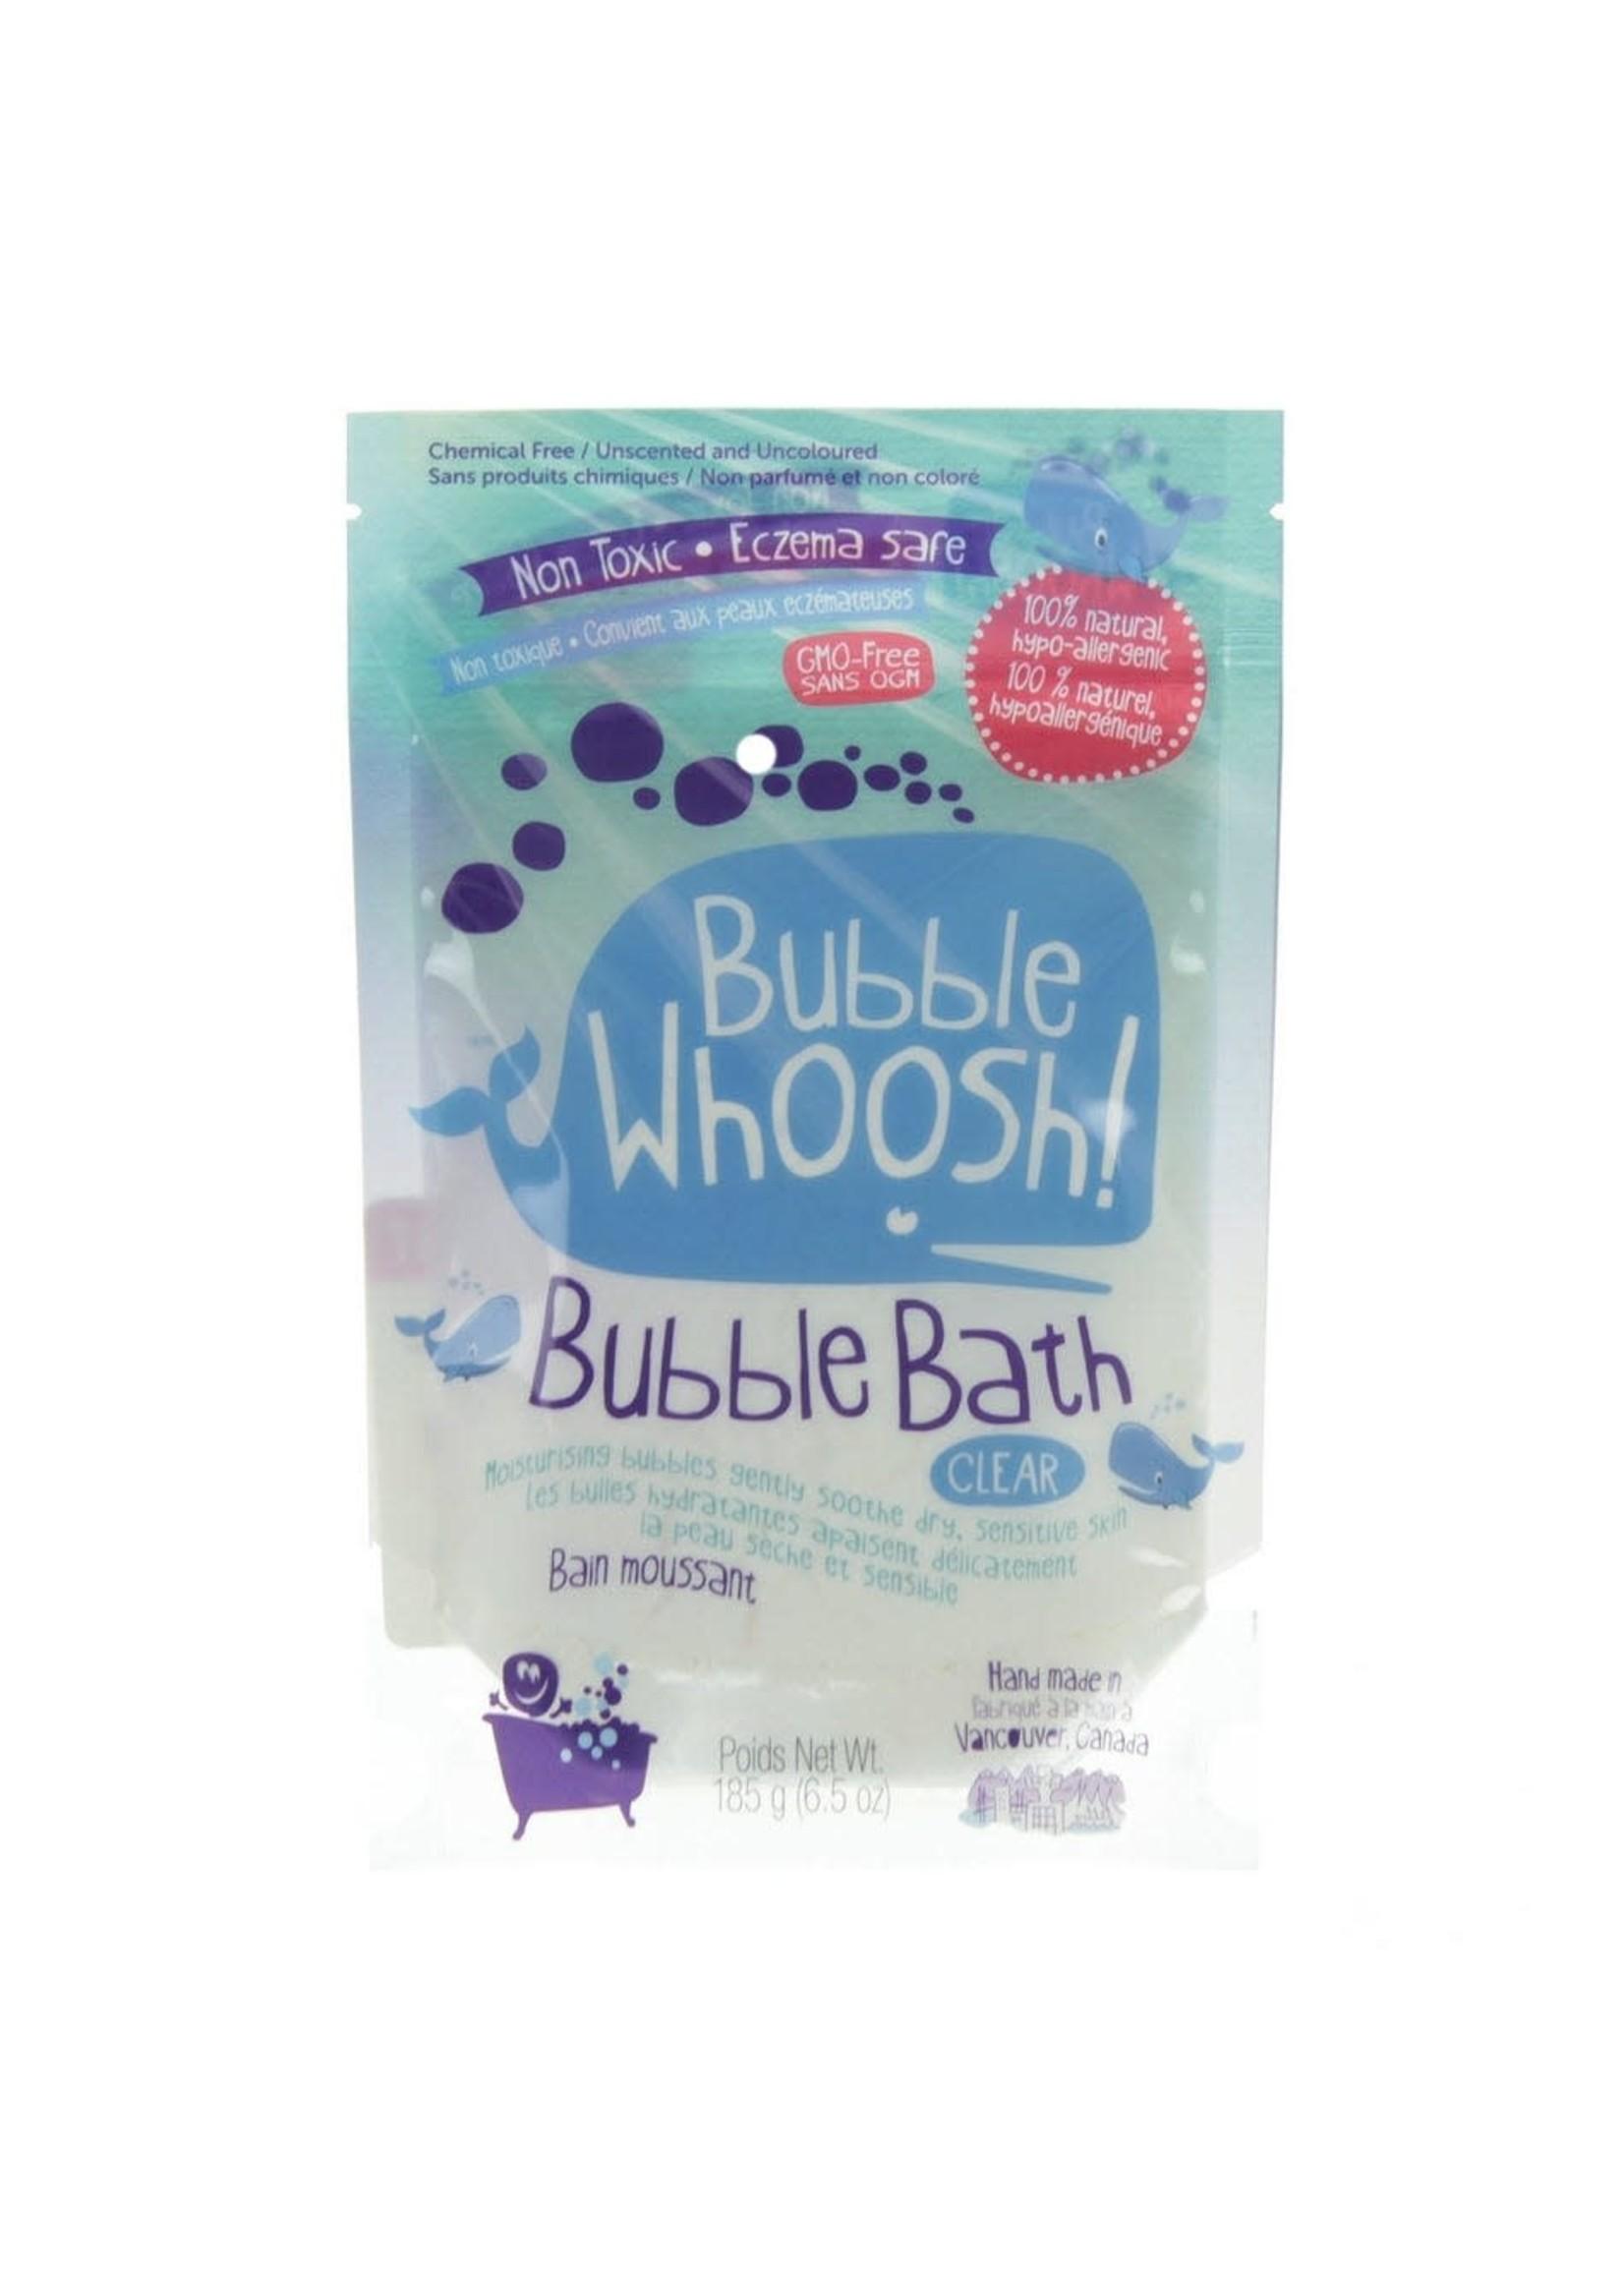 Bubble Whoosh Bubble Bath (Clear)